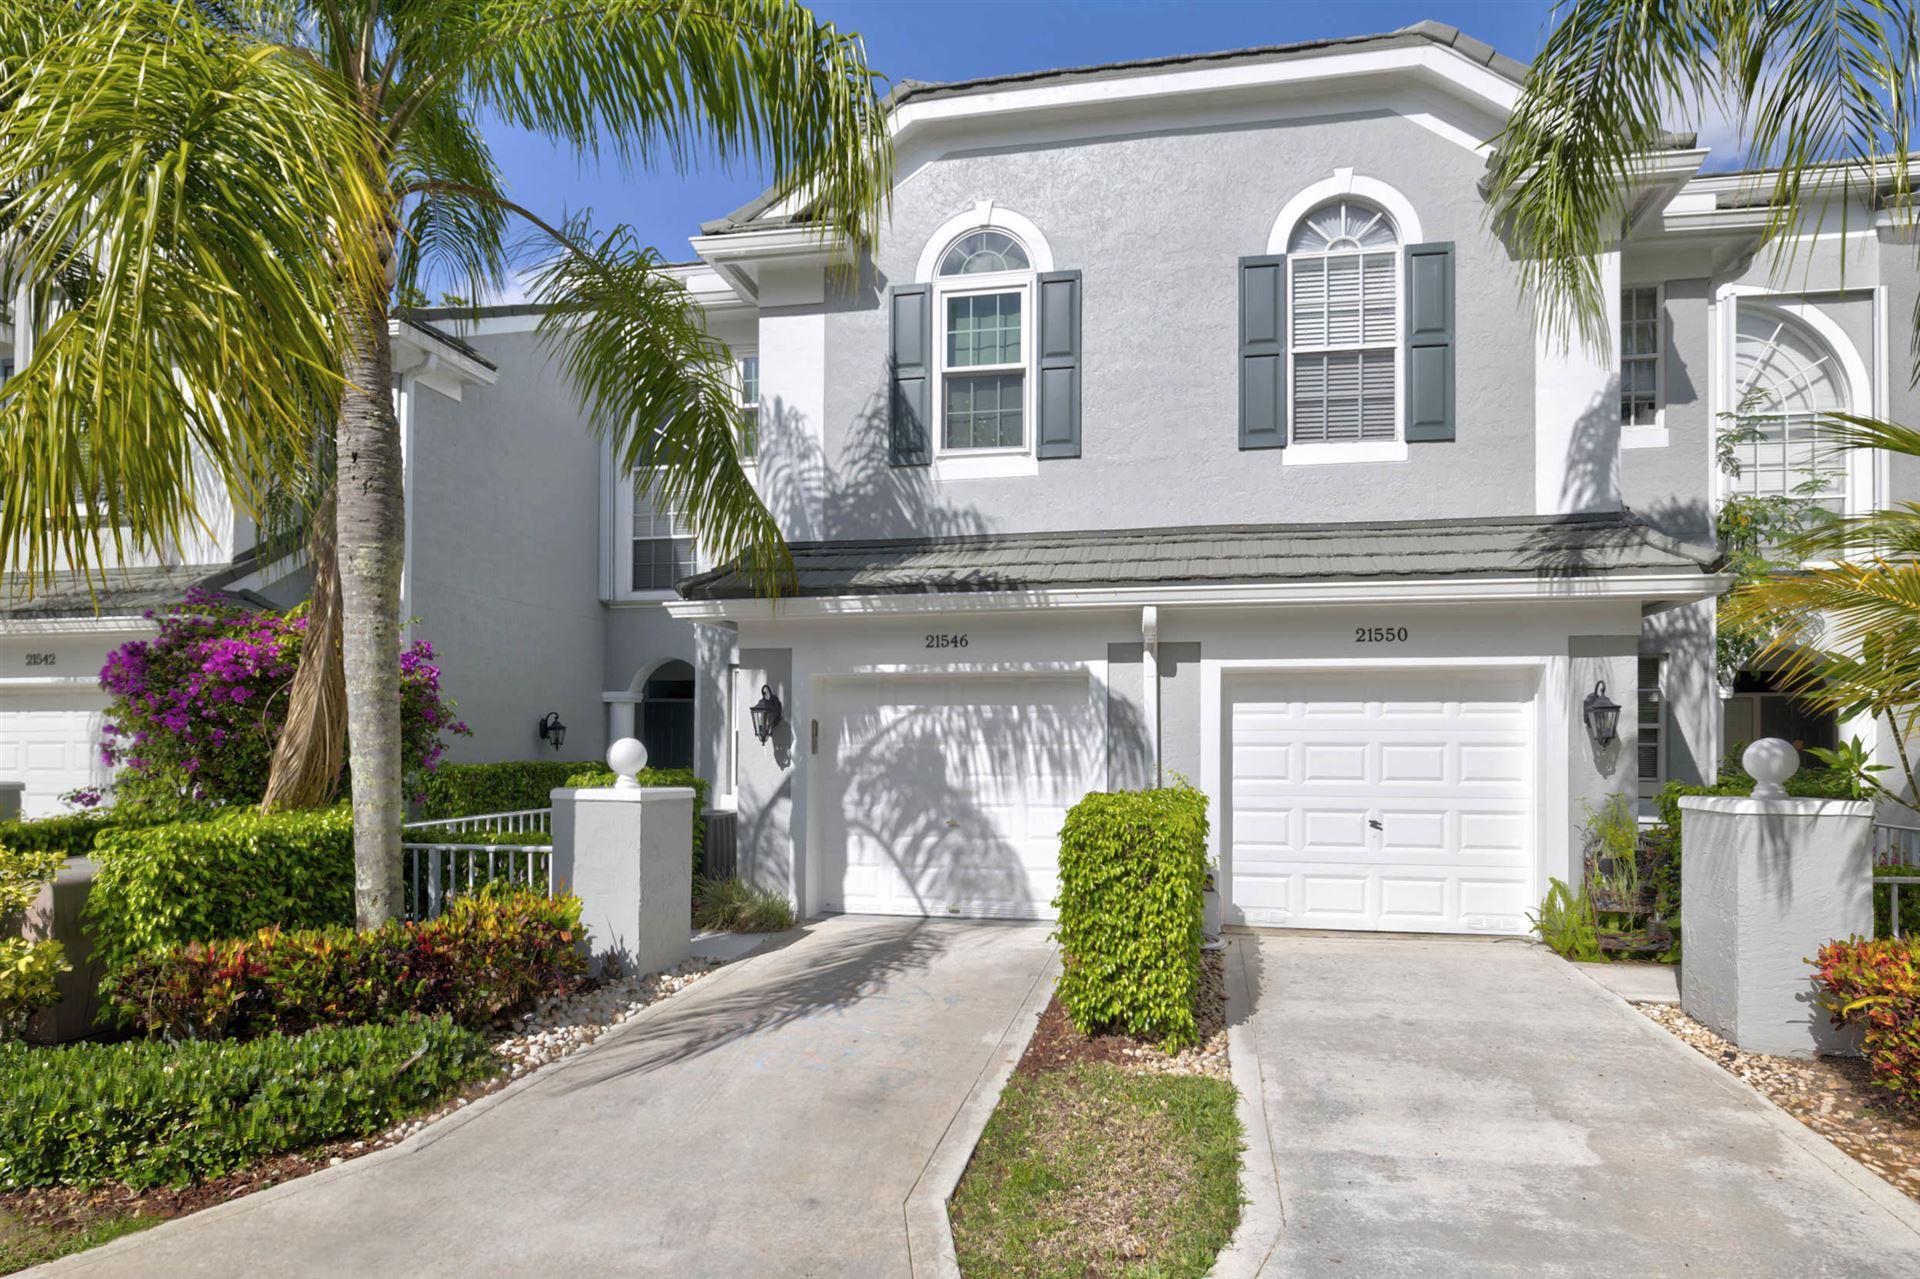 21546 Saint Andrews Grand Circle #31, Boca Raton, FL 33486 - MLS#: RX-10717037